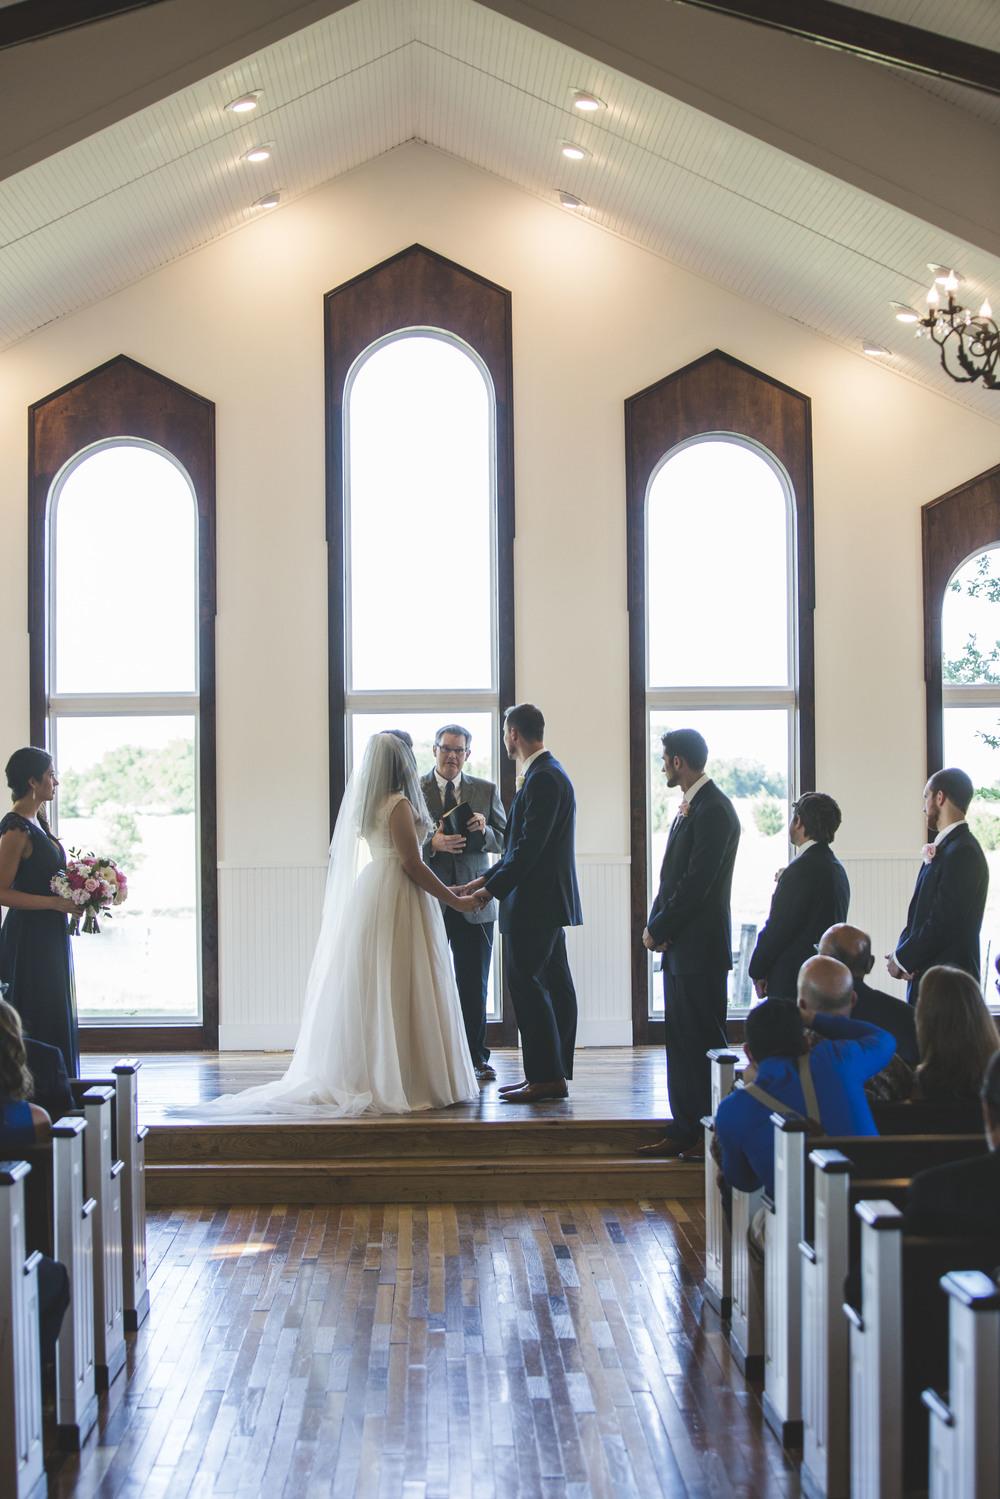 ATGI_Cory & Jackie_Wedding_2S8A2973.jpg